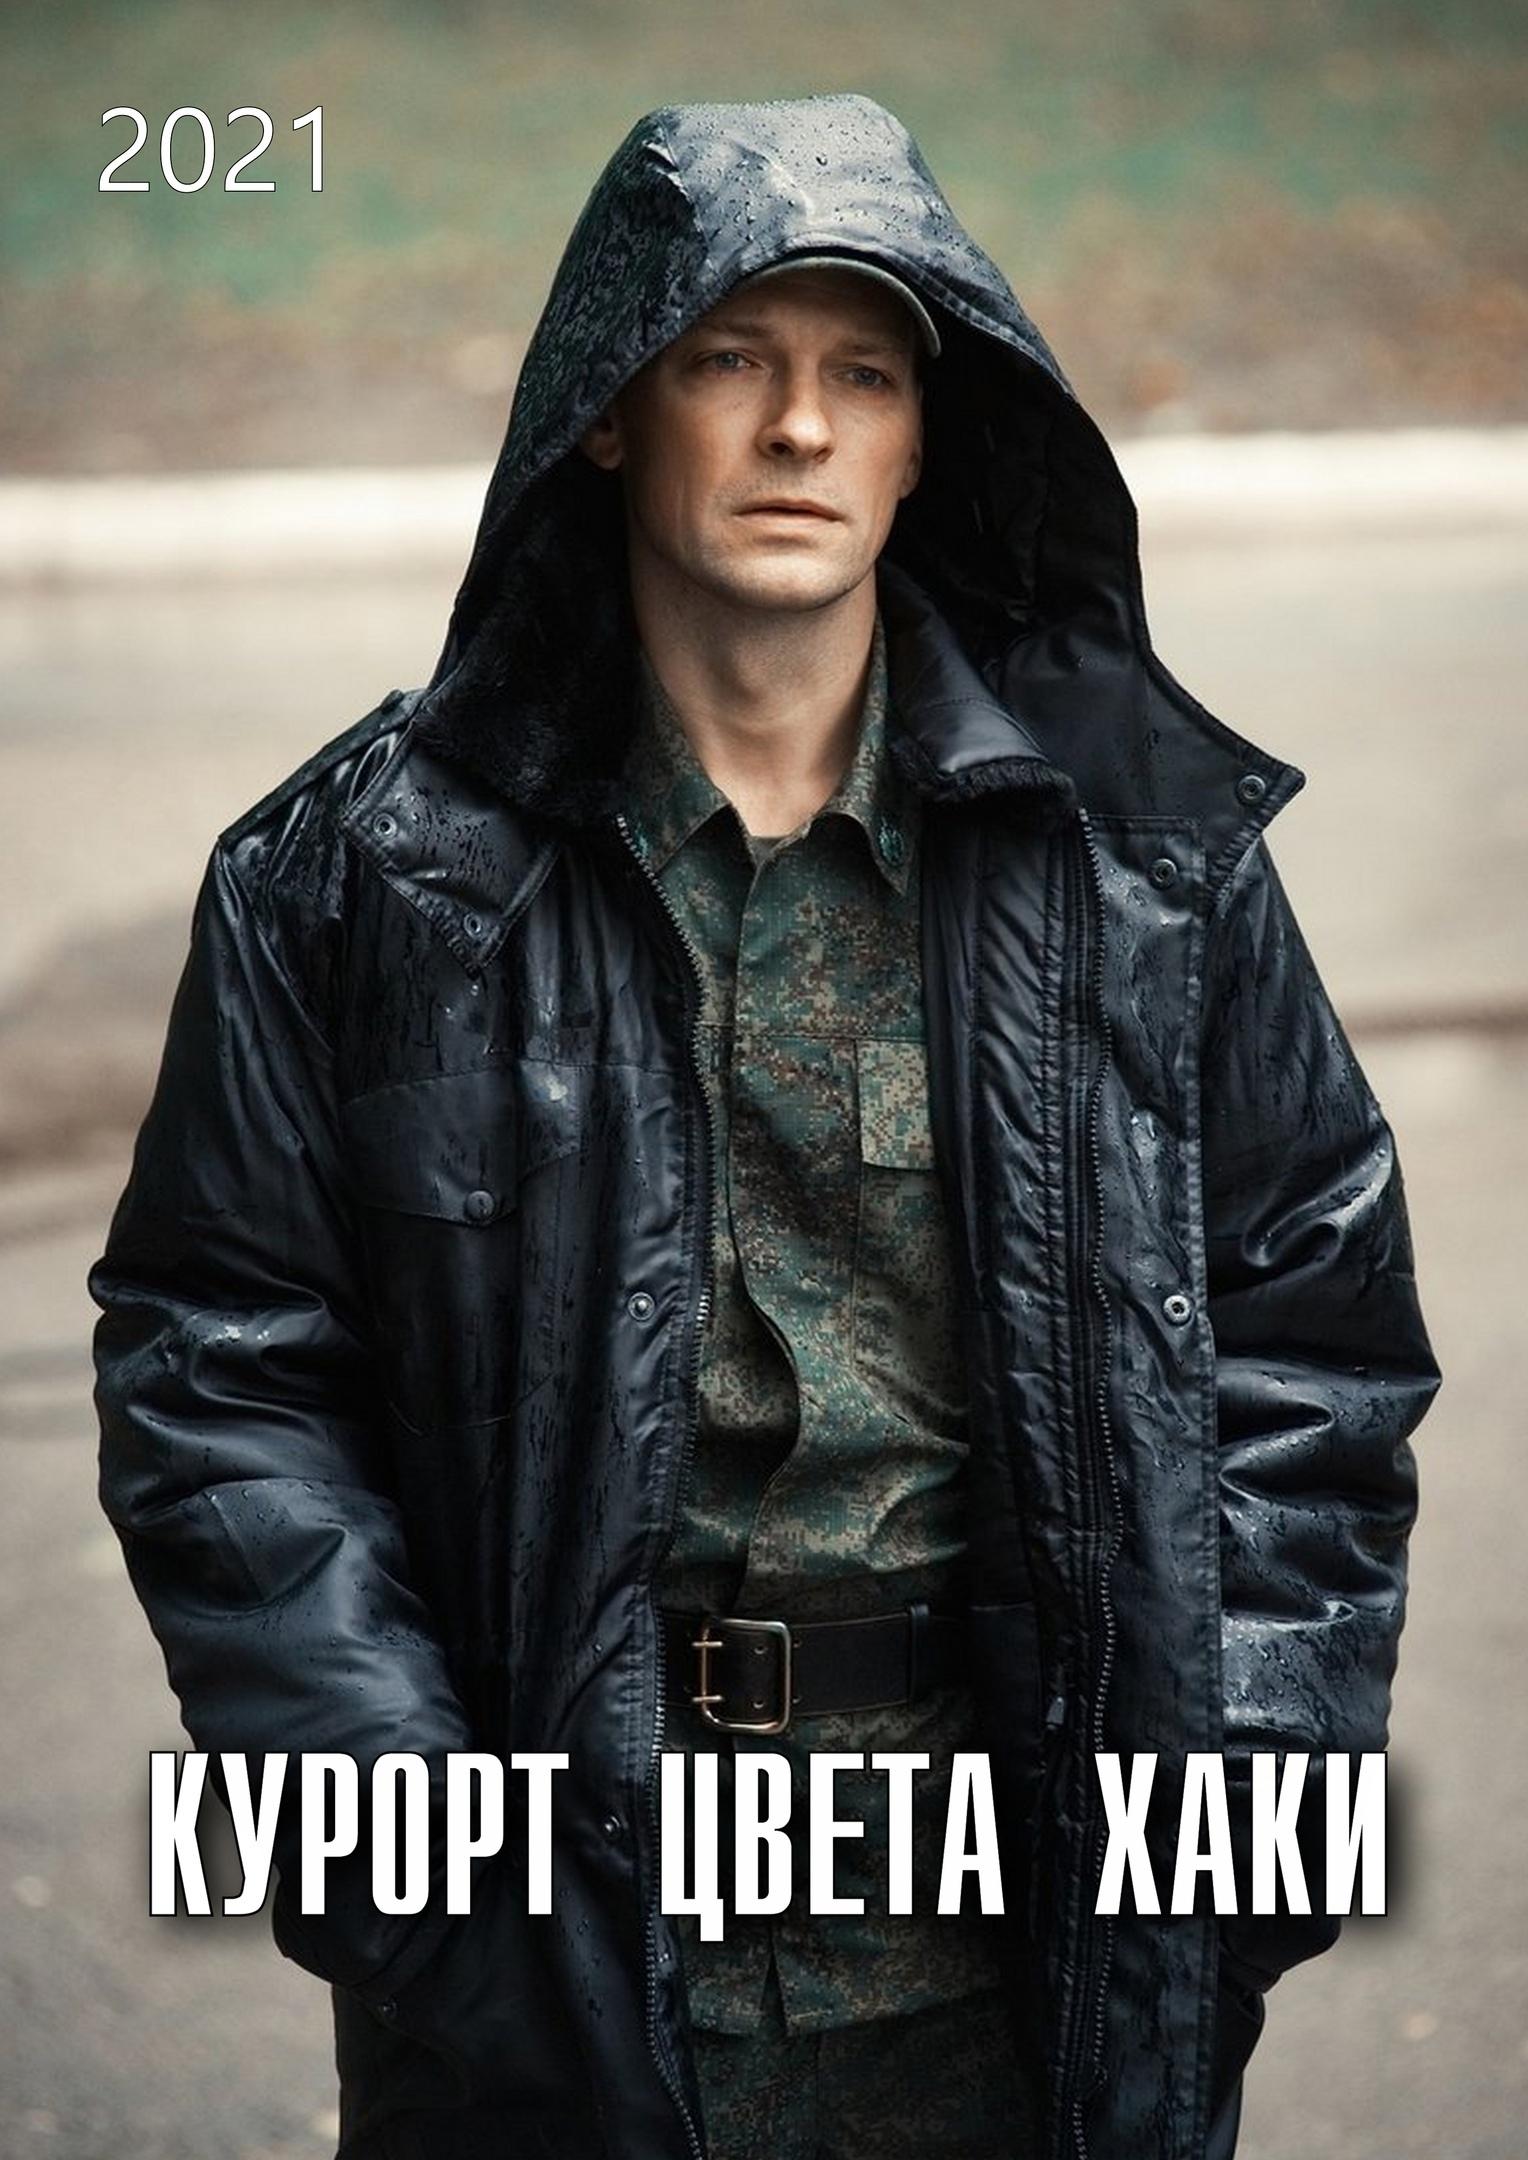 Детектив «Kypopт цвeтa xaки» (2021) 1-6 серия из 8